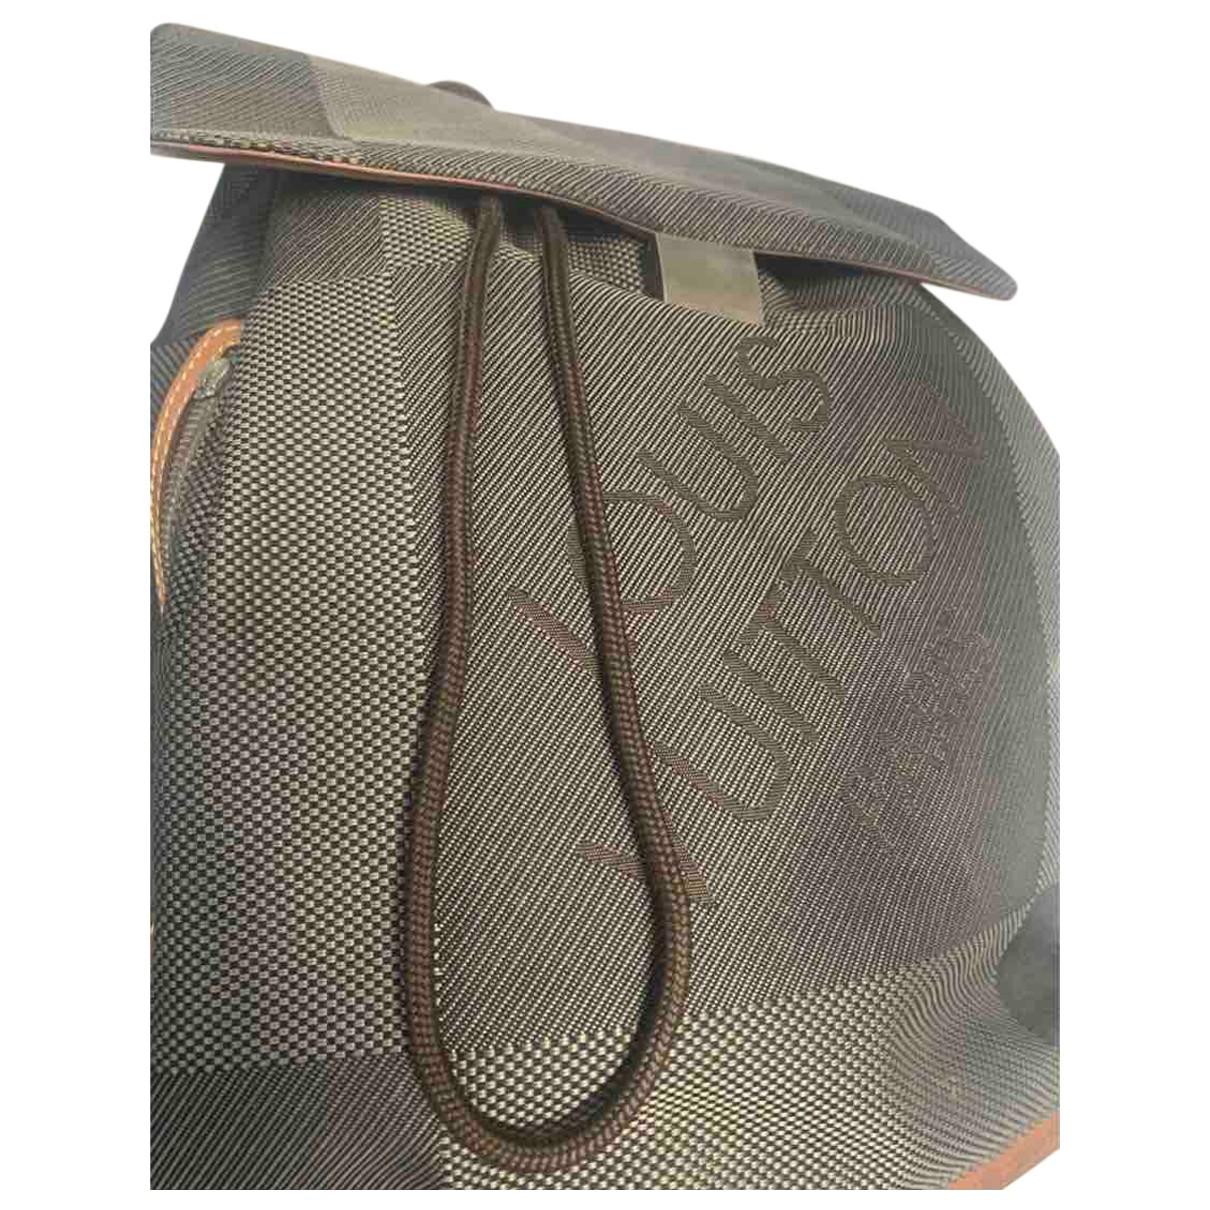 Mochila de Lona Louis Vuitton